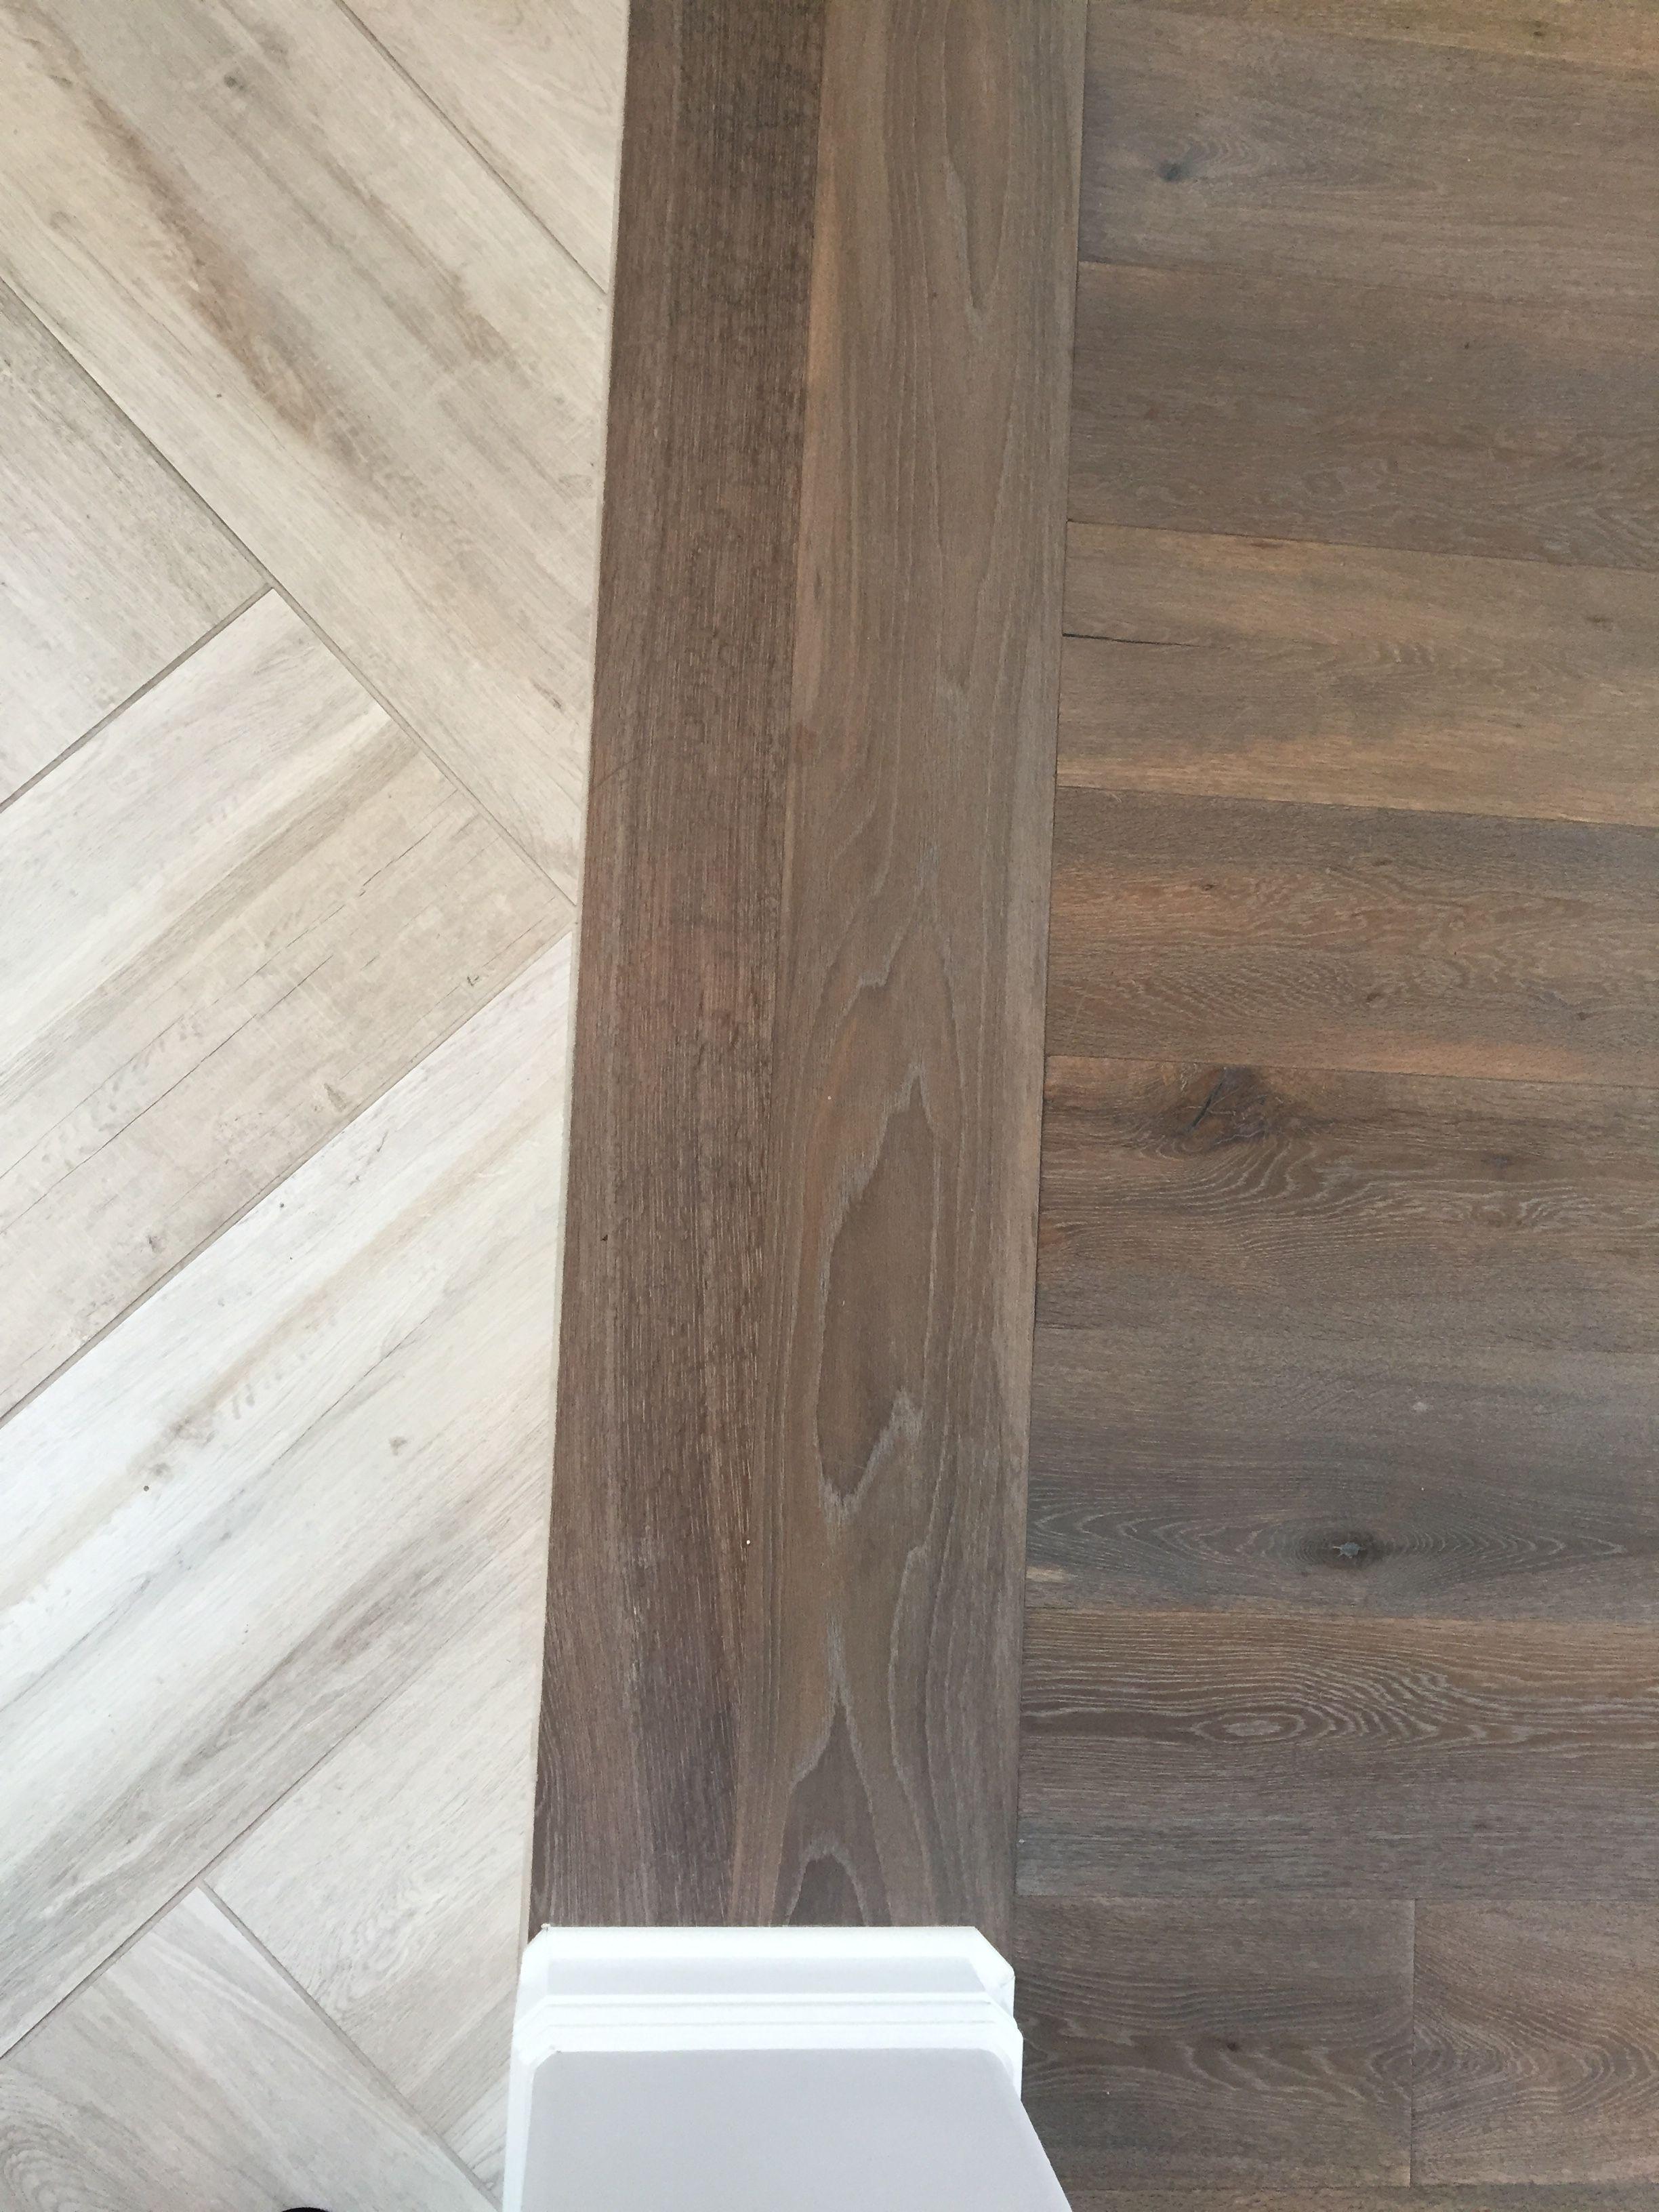 Hardwood Floor Cleaning Companies Of Floor Transition Laminate to Herringbone Tile Pattern Model Pertaining to Floor Transition Laminate to Herringbone Tile Pattern Herringbone Tile Pattern Herringbone Wood Floor